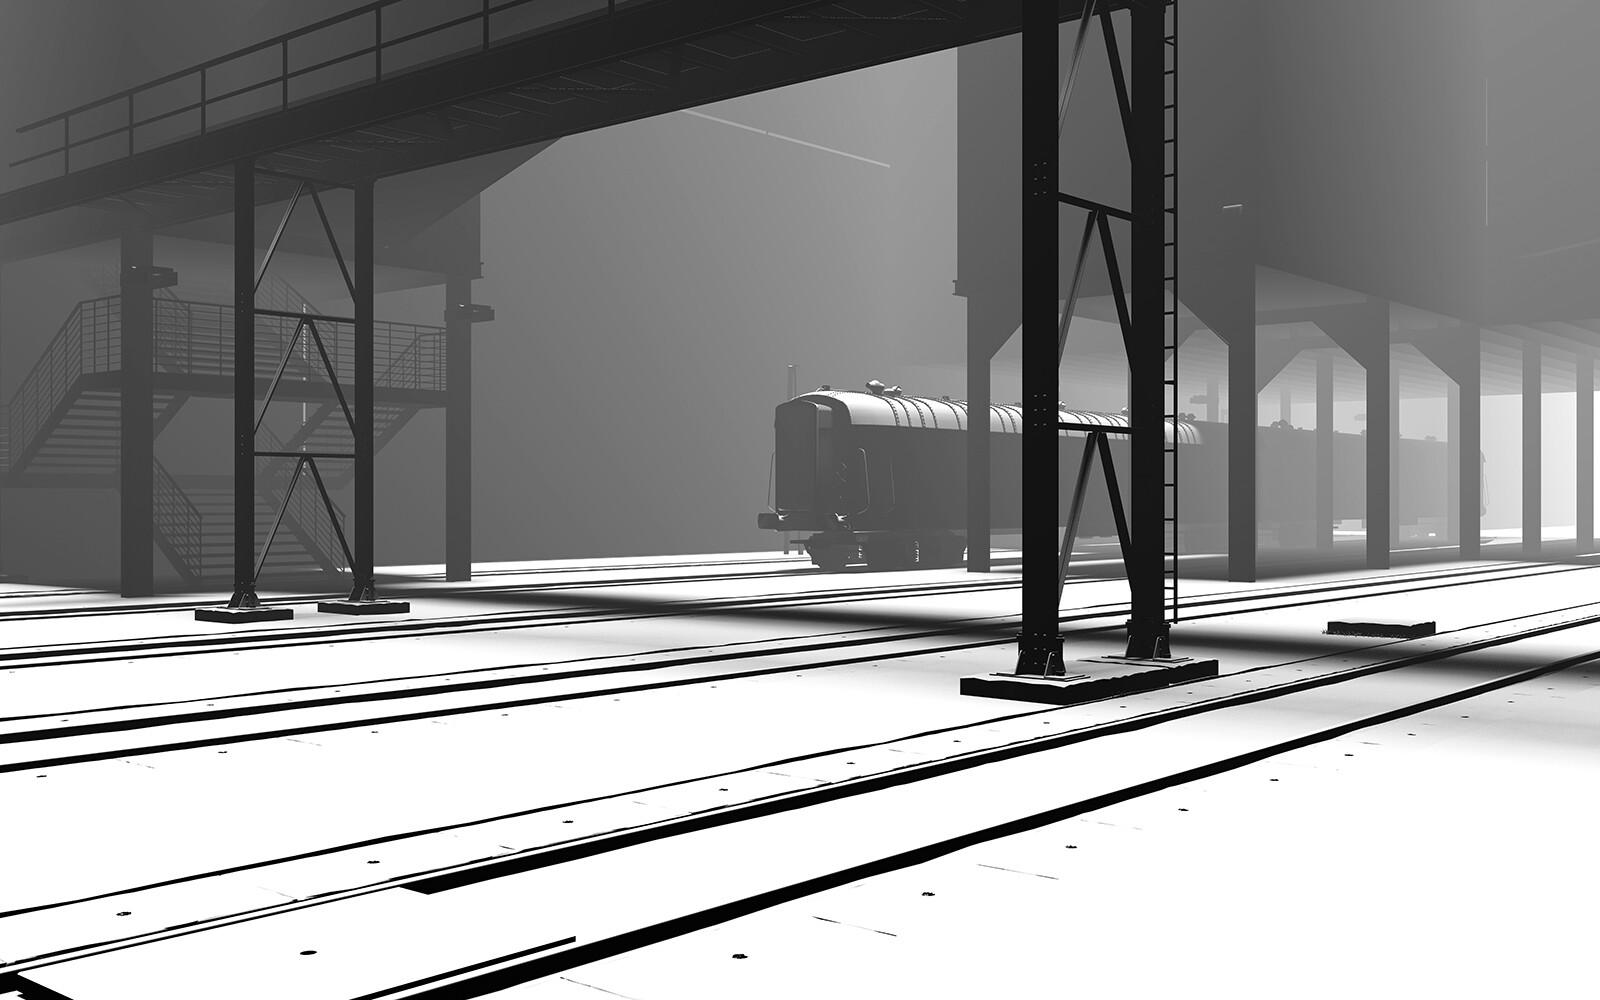 Bahnsteig - Gero Gries